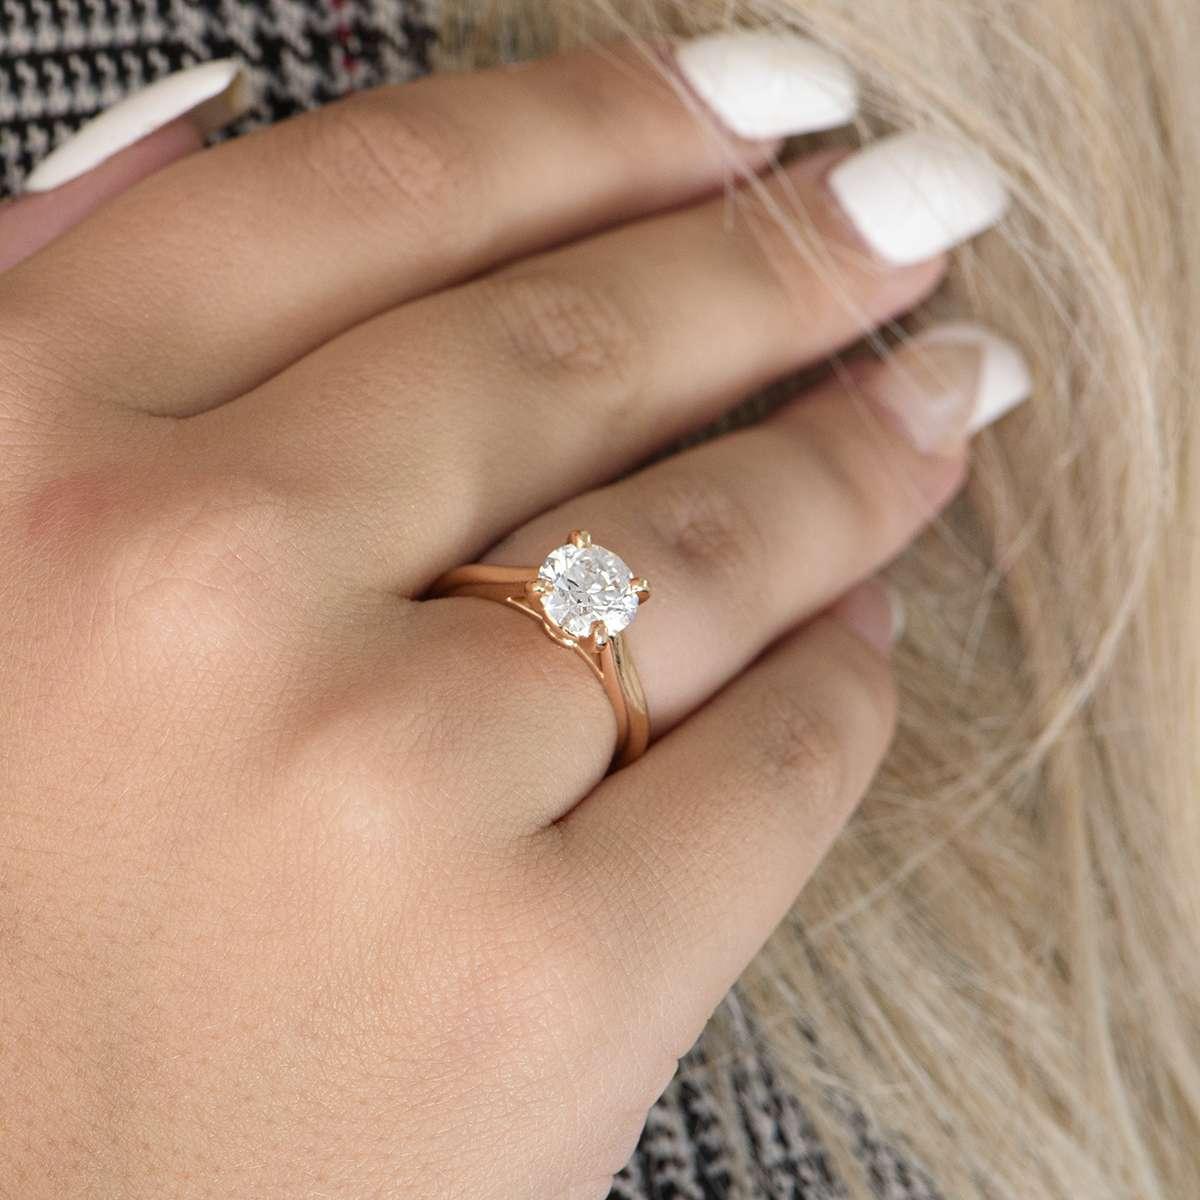 Cartier Rose Gold Solitaire 1895 Diamond Ring 1.64ct H/VVS1 XXX